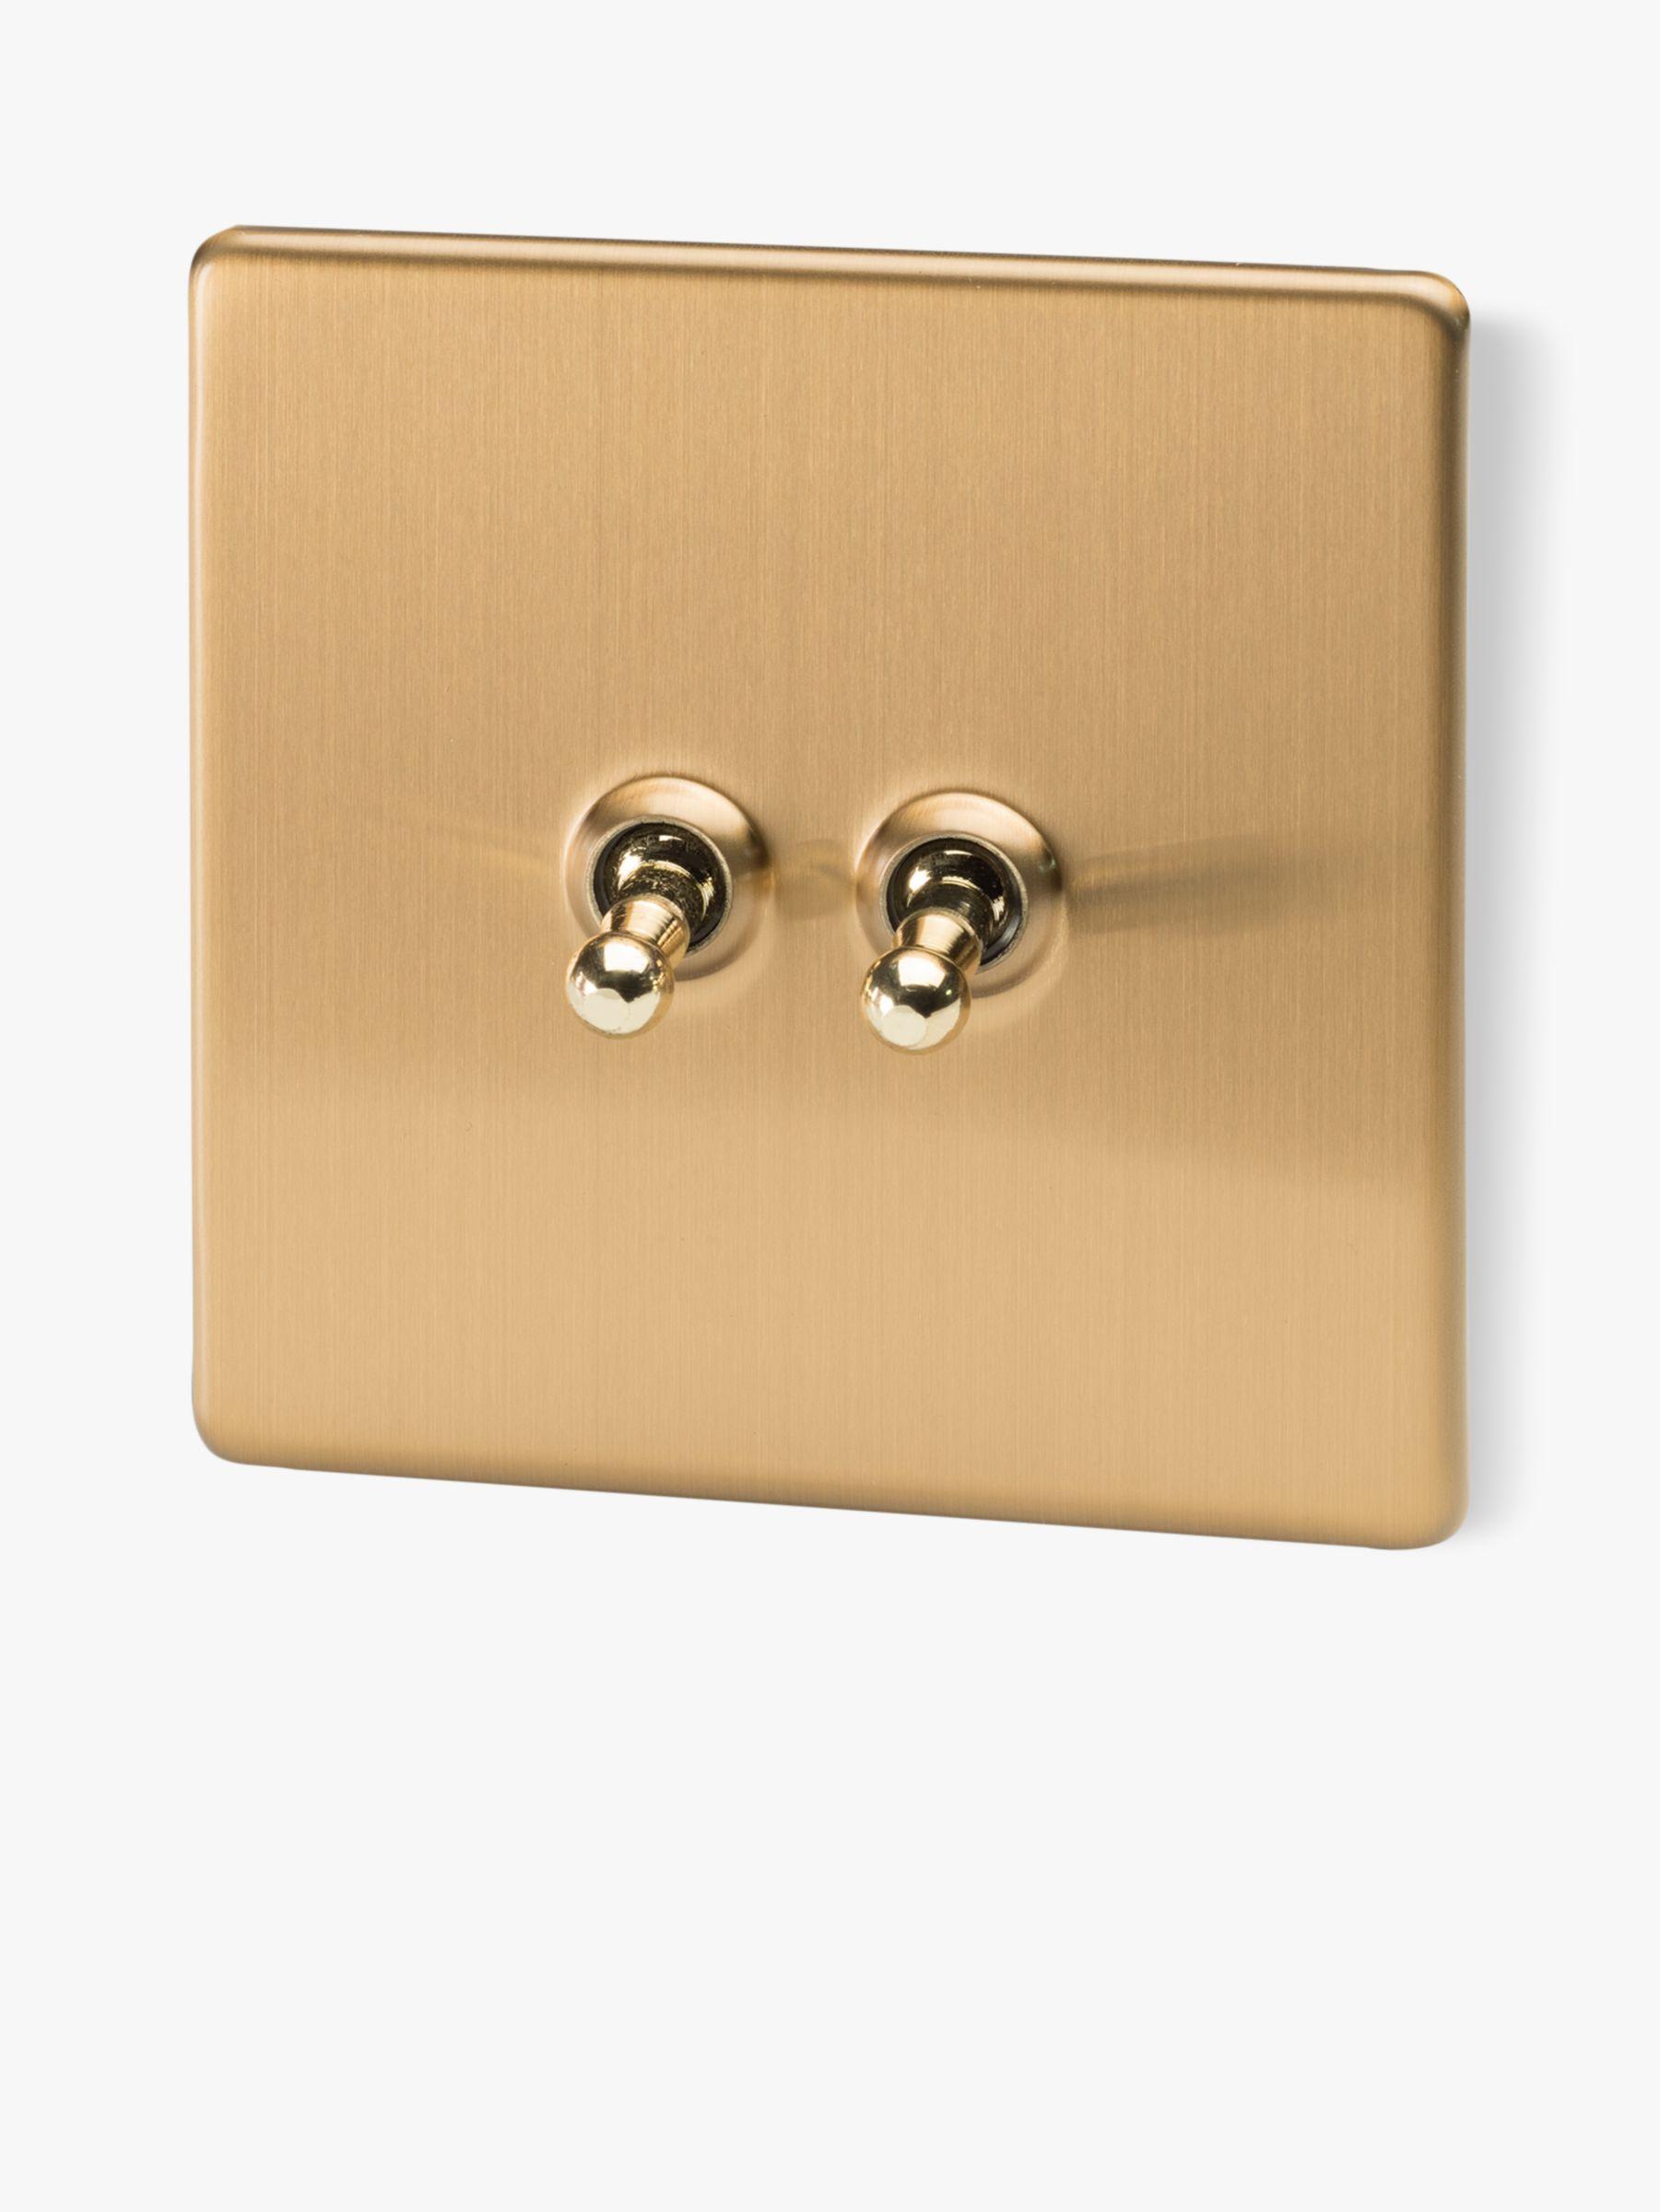 Varilight Varilight 2 Gang 2-Way Toggle Switch, Brushed Brass